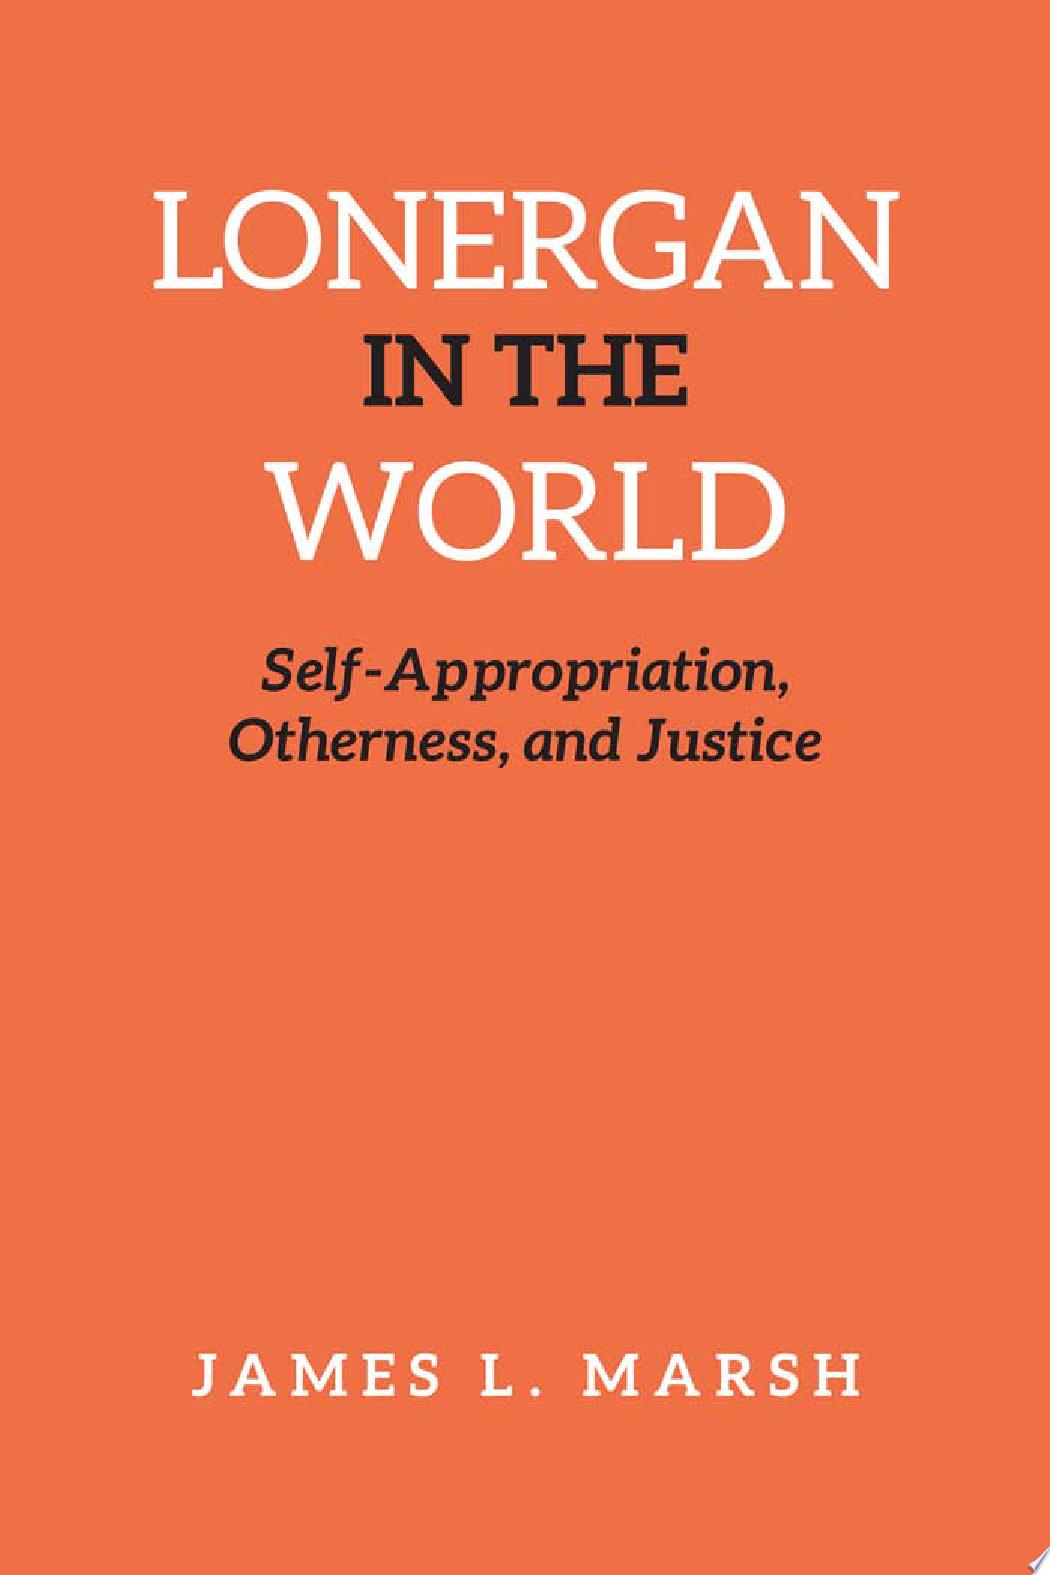 Lonergan in the World